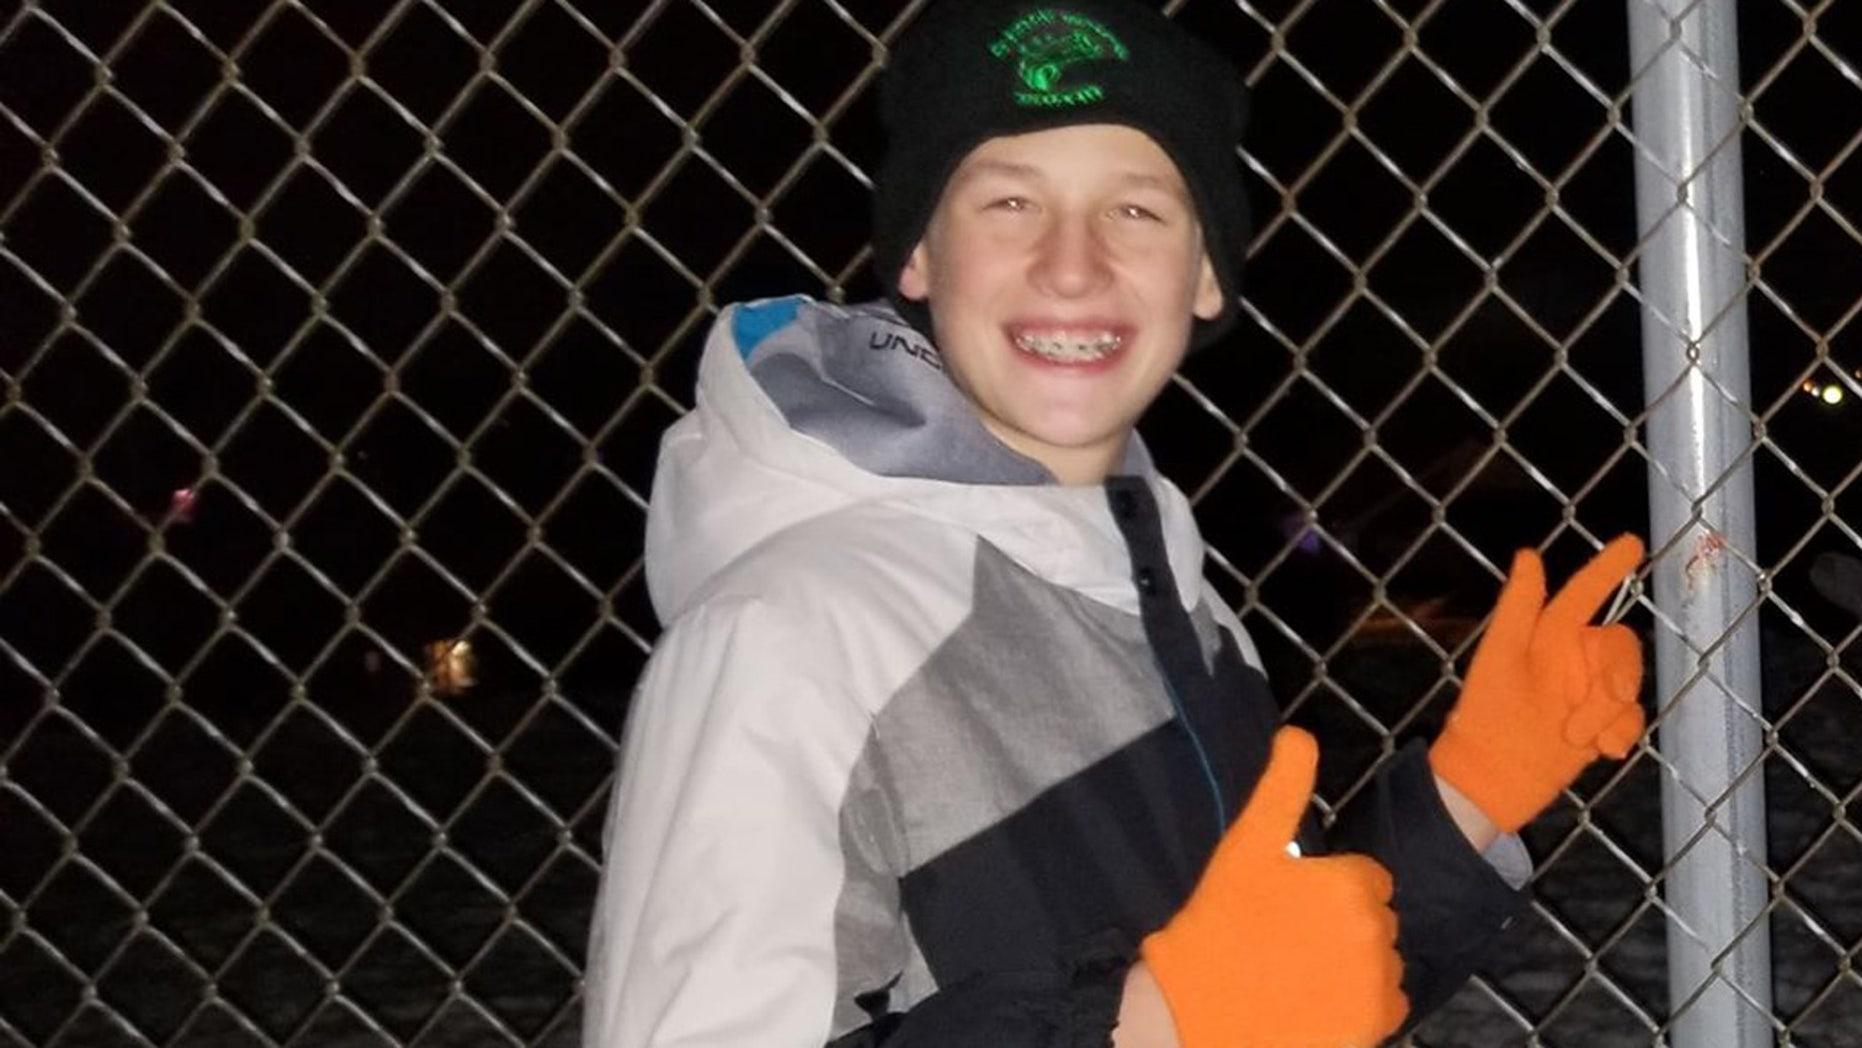 Spencer Kline, 11, poses next to where he got his tongue stuck to a cold pole.